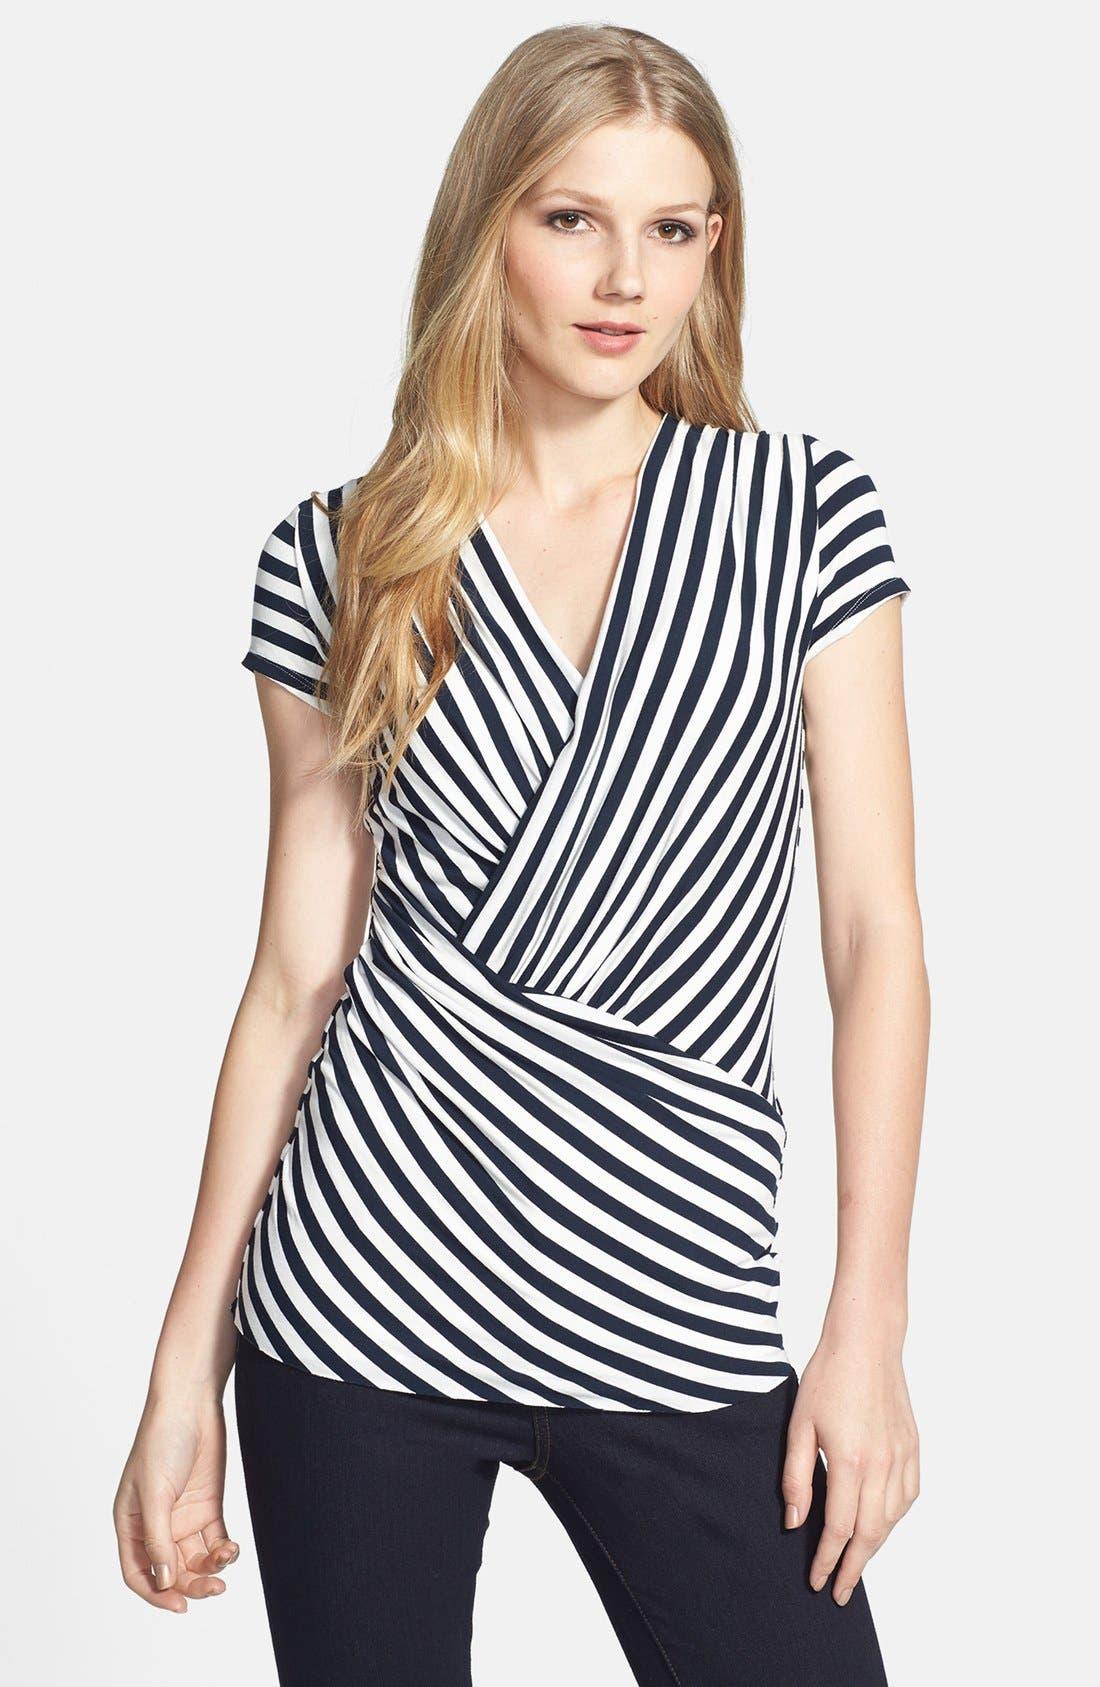 Alternate Image 1 Selected - Vince Camuto 'Marina Stripe' Asymmetrical Top (Regular & Petite)